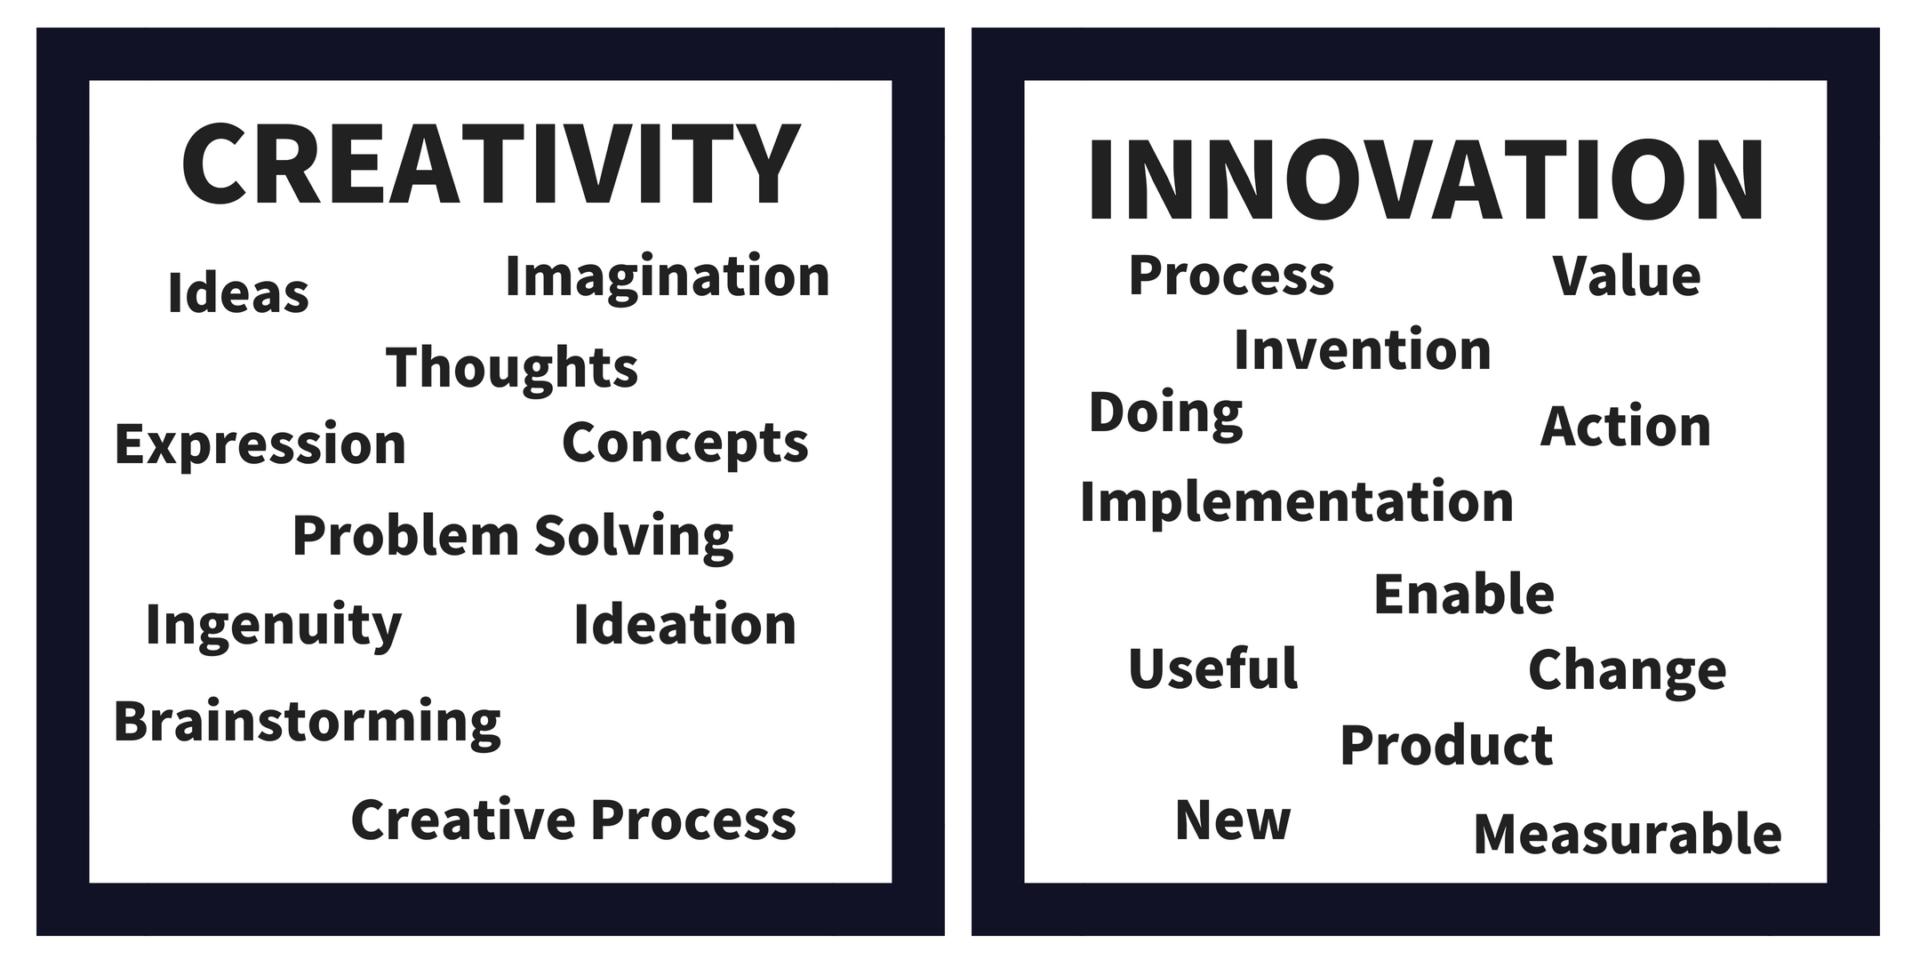 Creativity vs Innovation